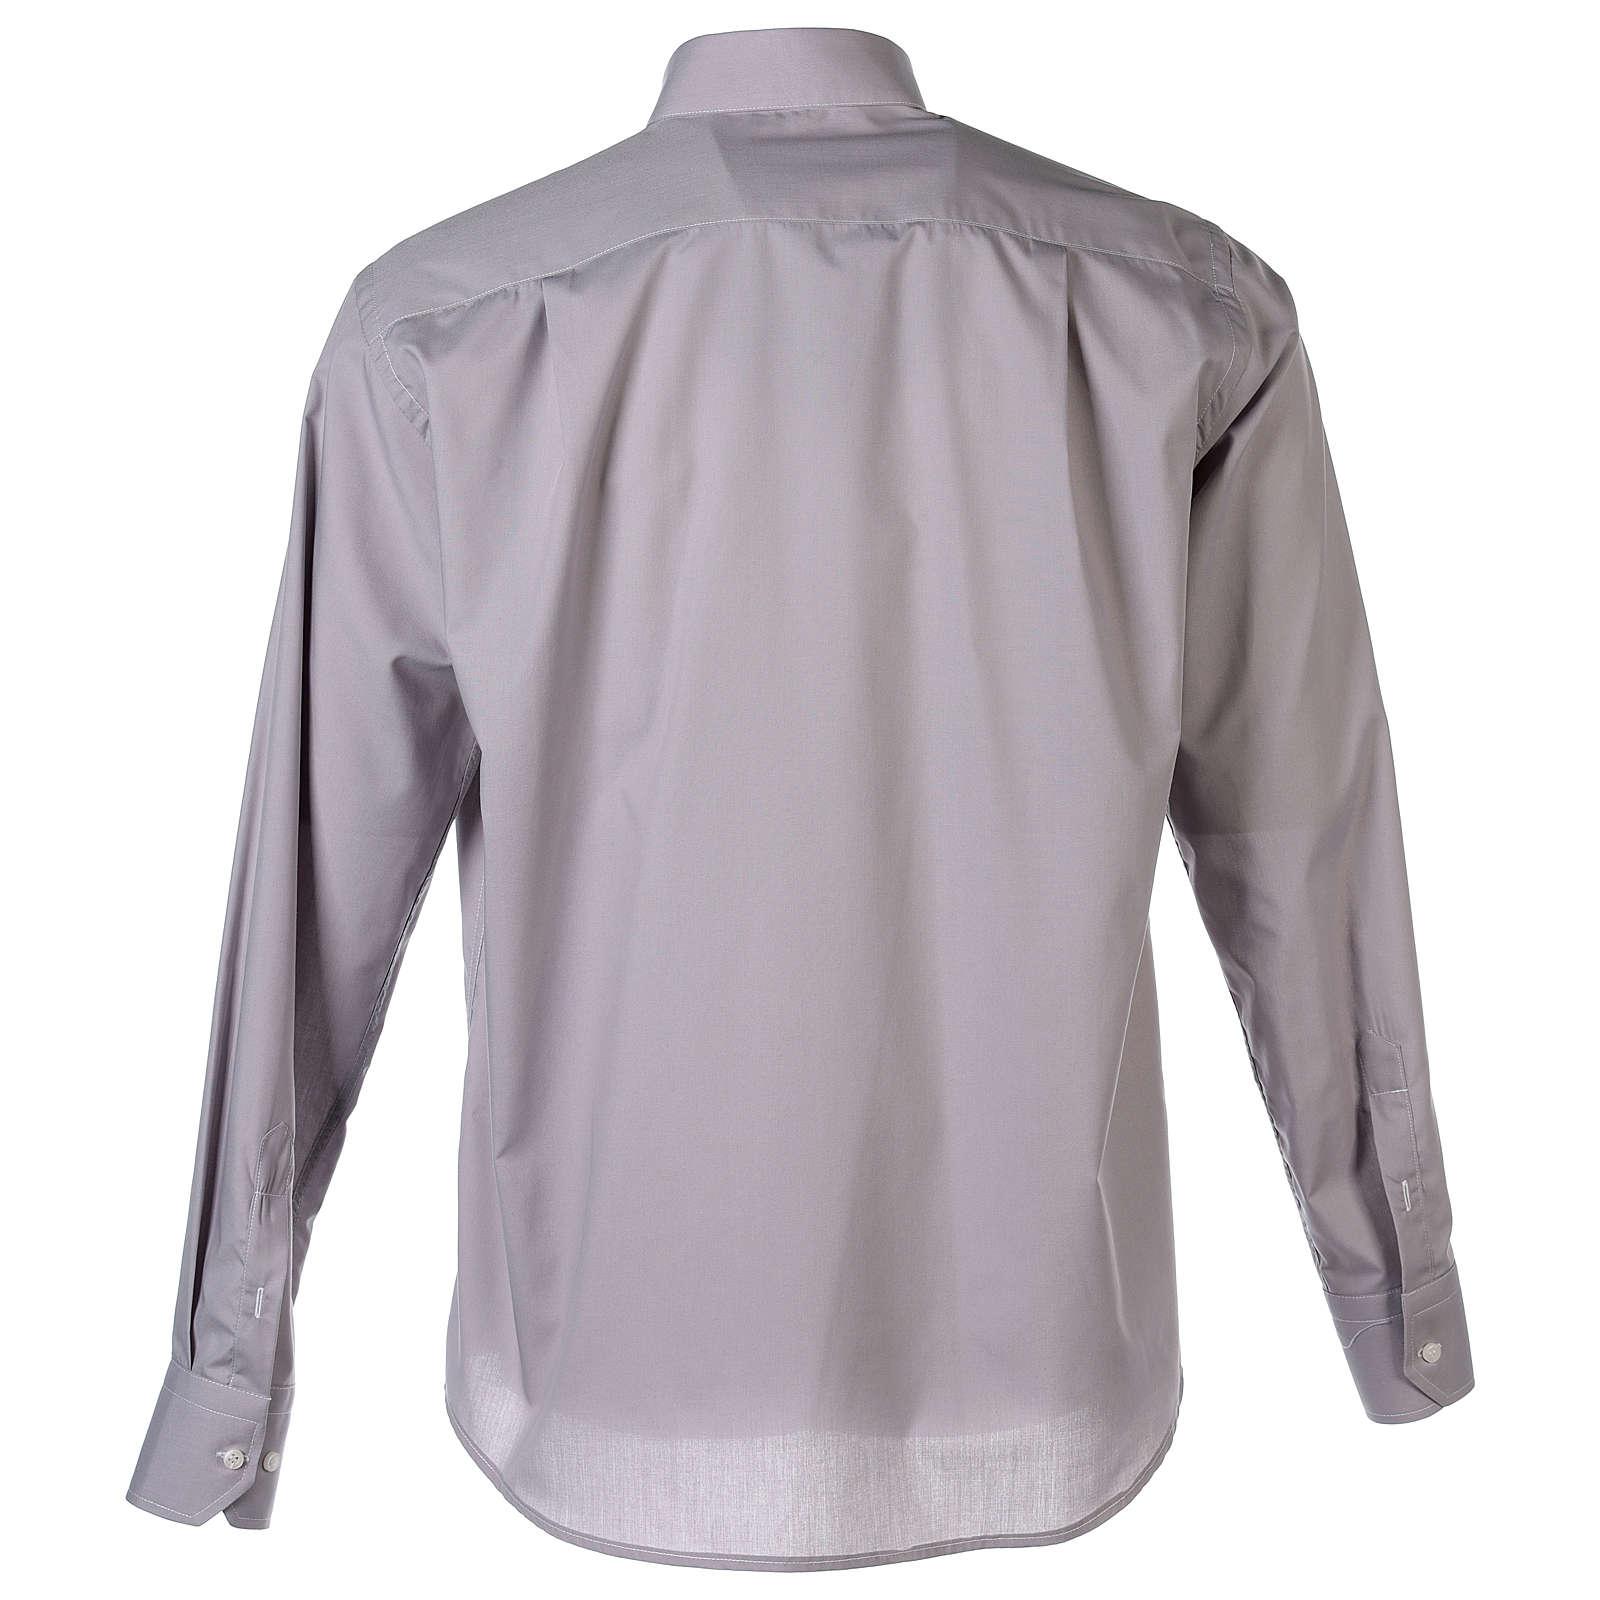 Tab Collar Light Grey Shirt long sleeve solid color mixed cotton 4